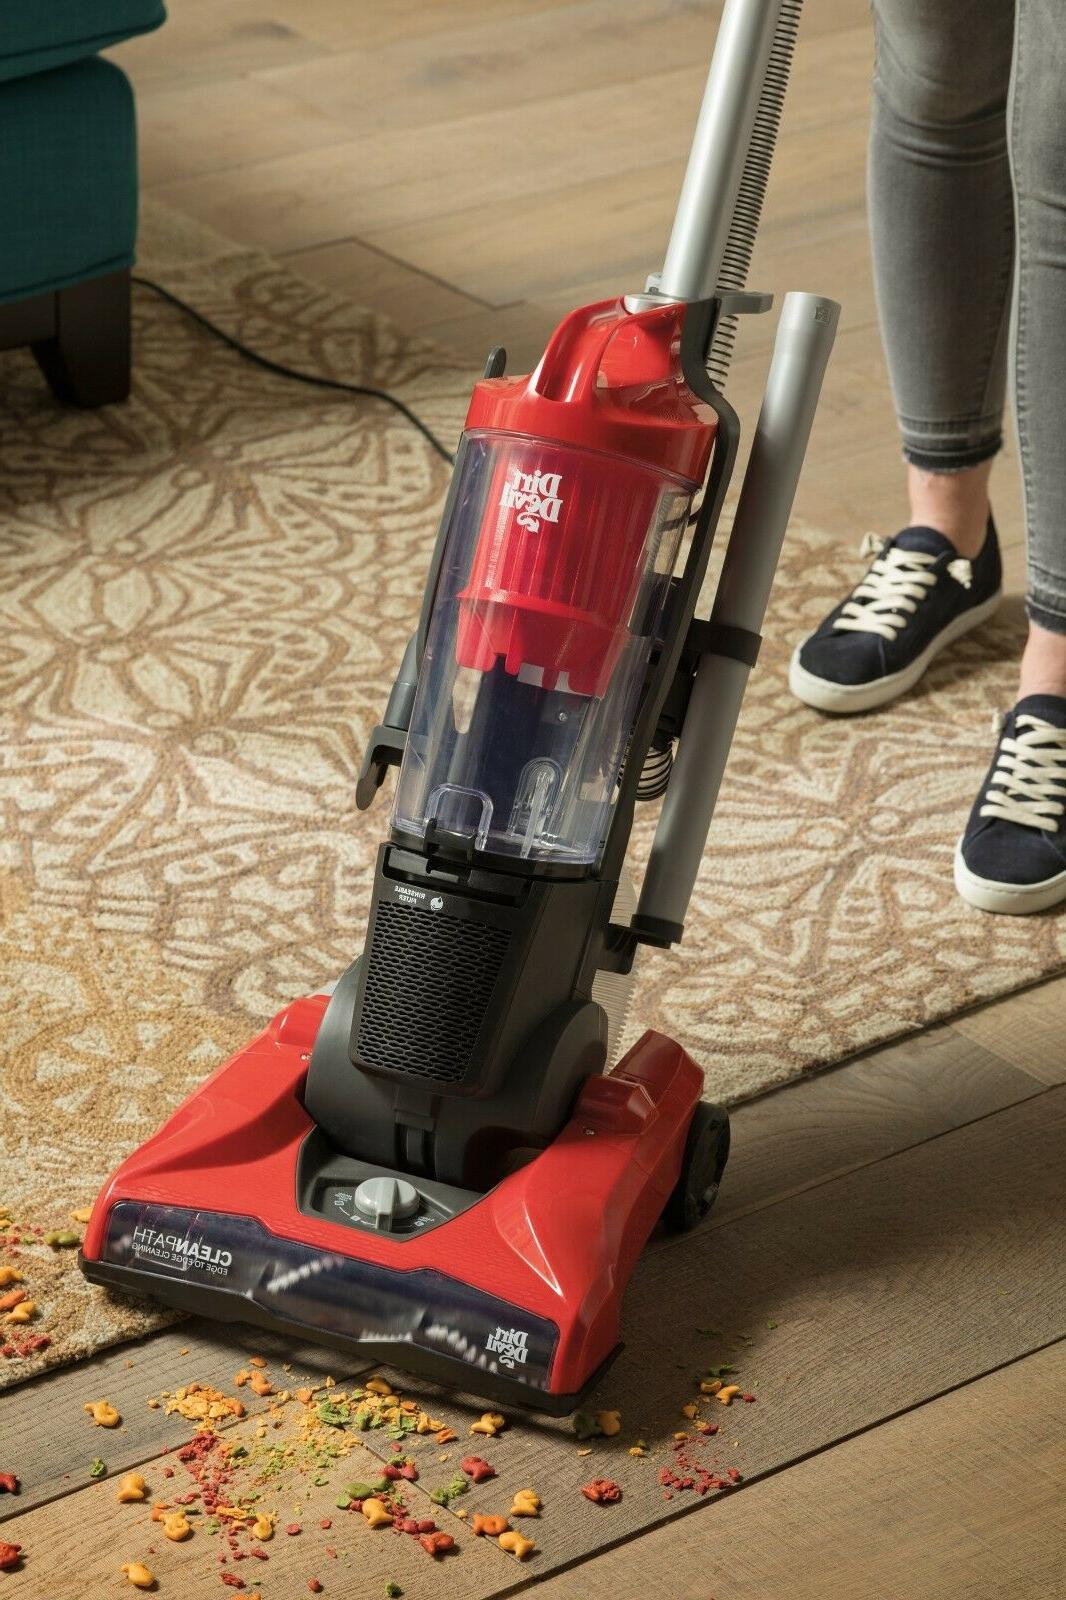 Dirt Devil Max Bagless Upright Vacuum UD70161